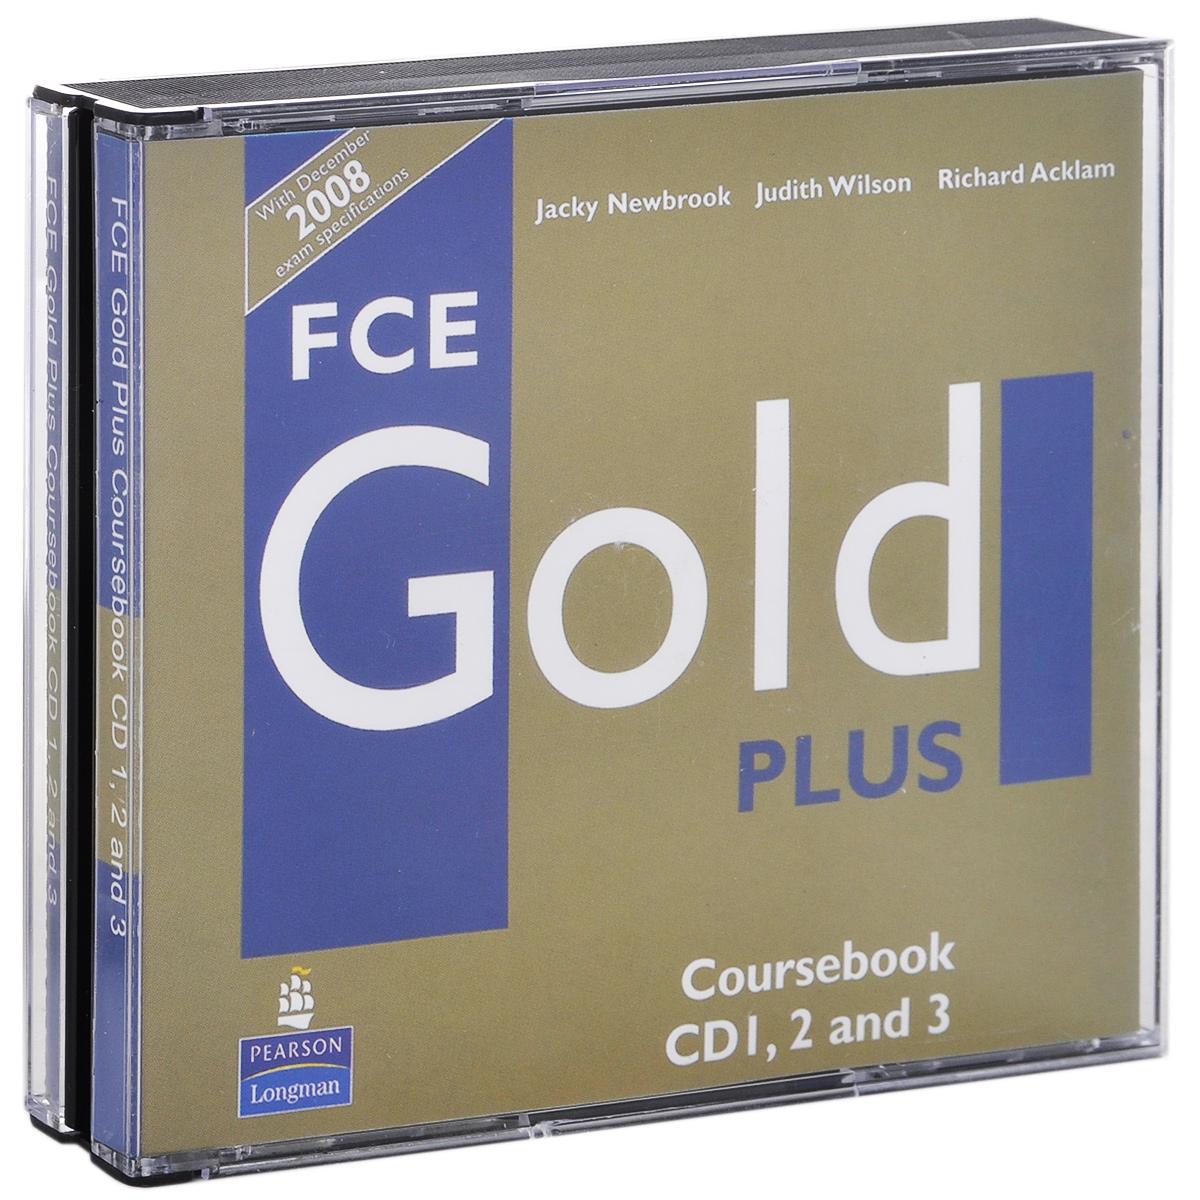 FCE Gold Plus: Coursebook (аудиокурс на 3 CD)